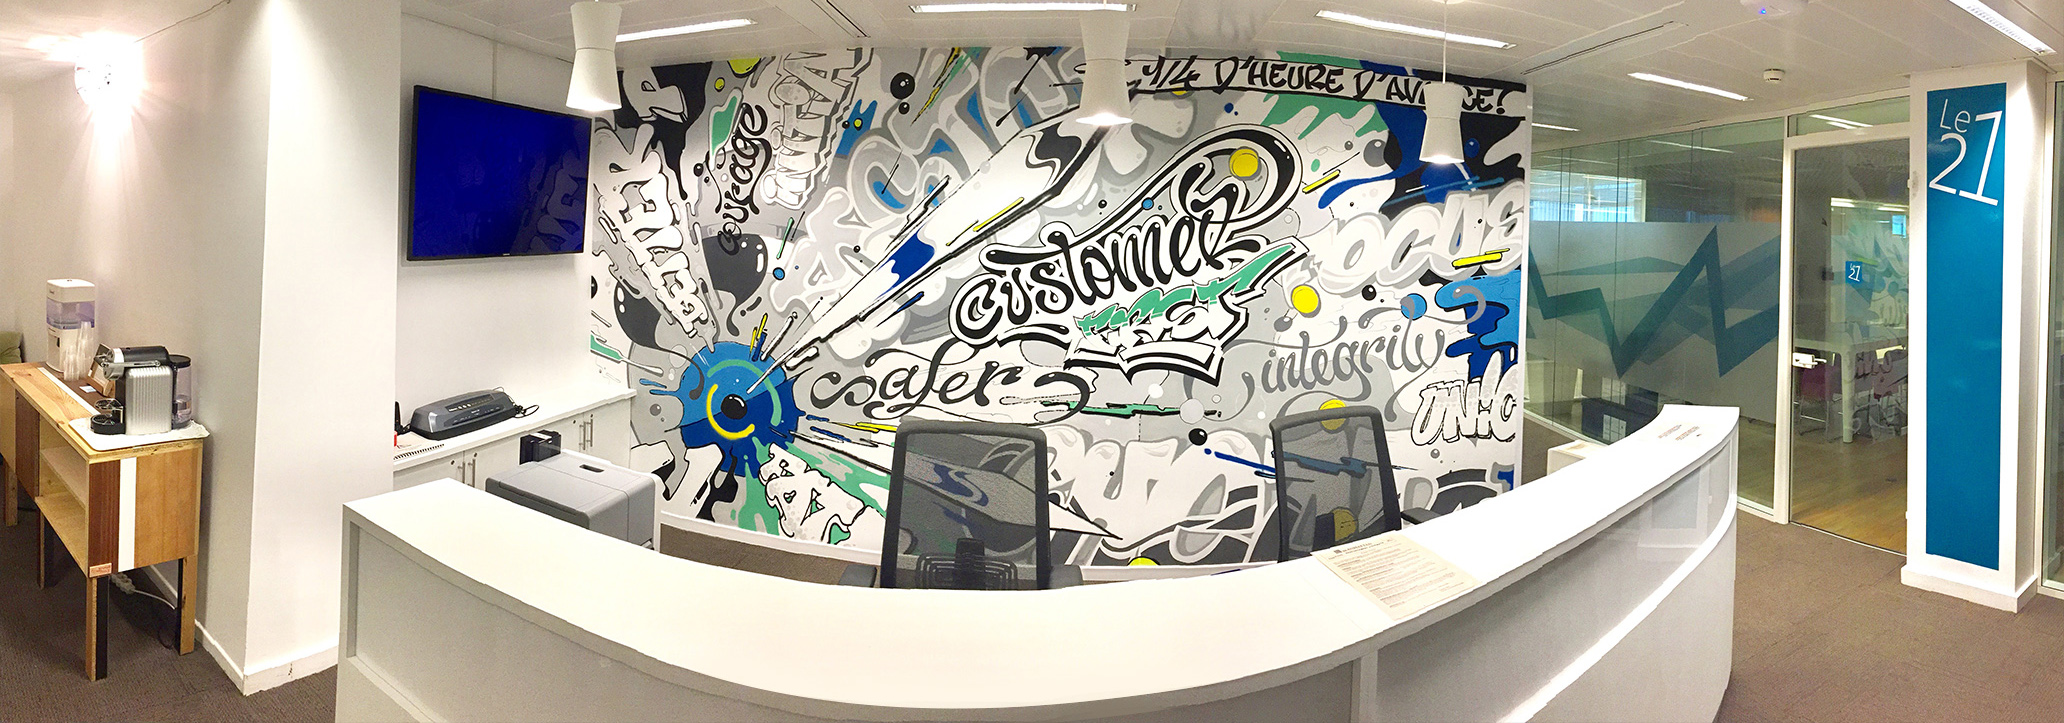 Street art, graph, graph, graffiti, mur, déco, urbain, street, original, paris